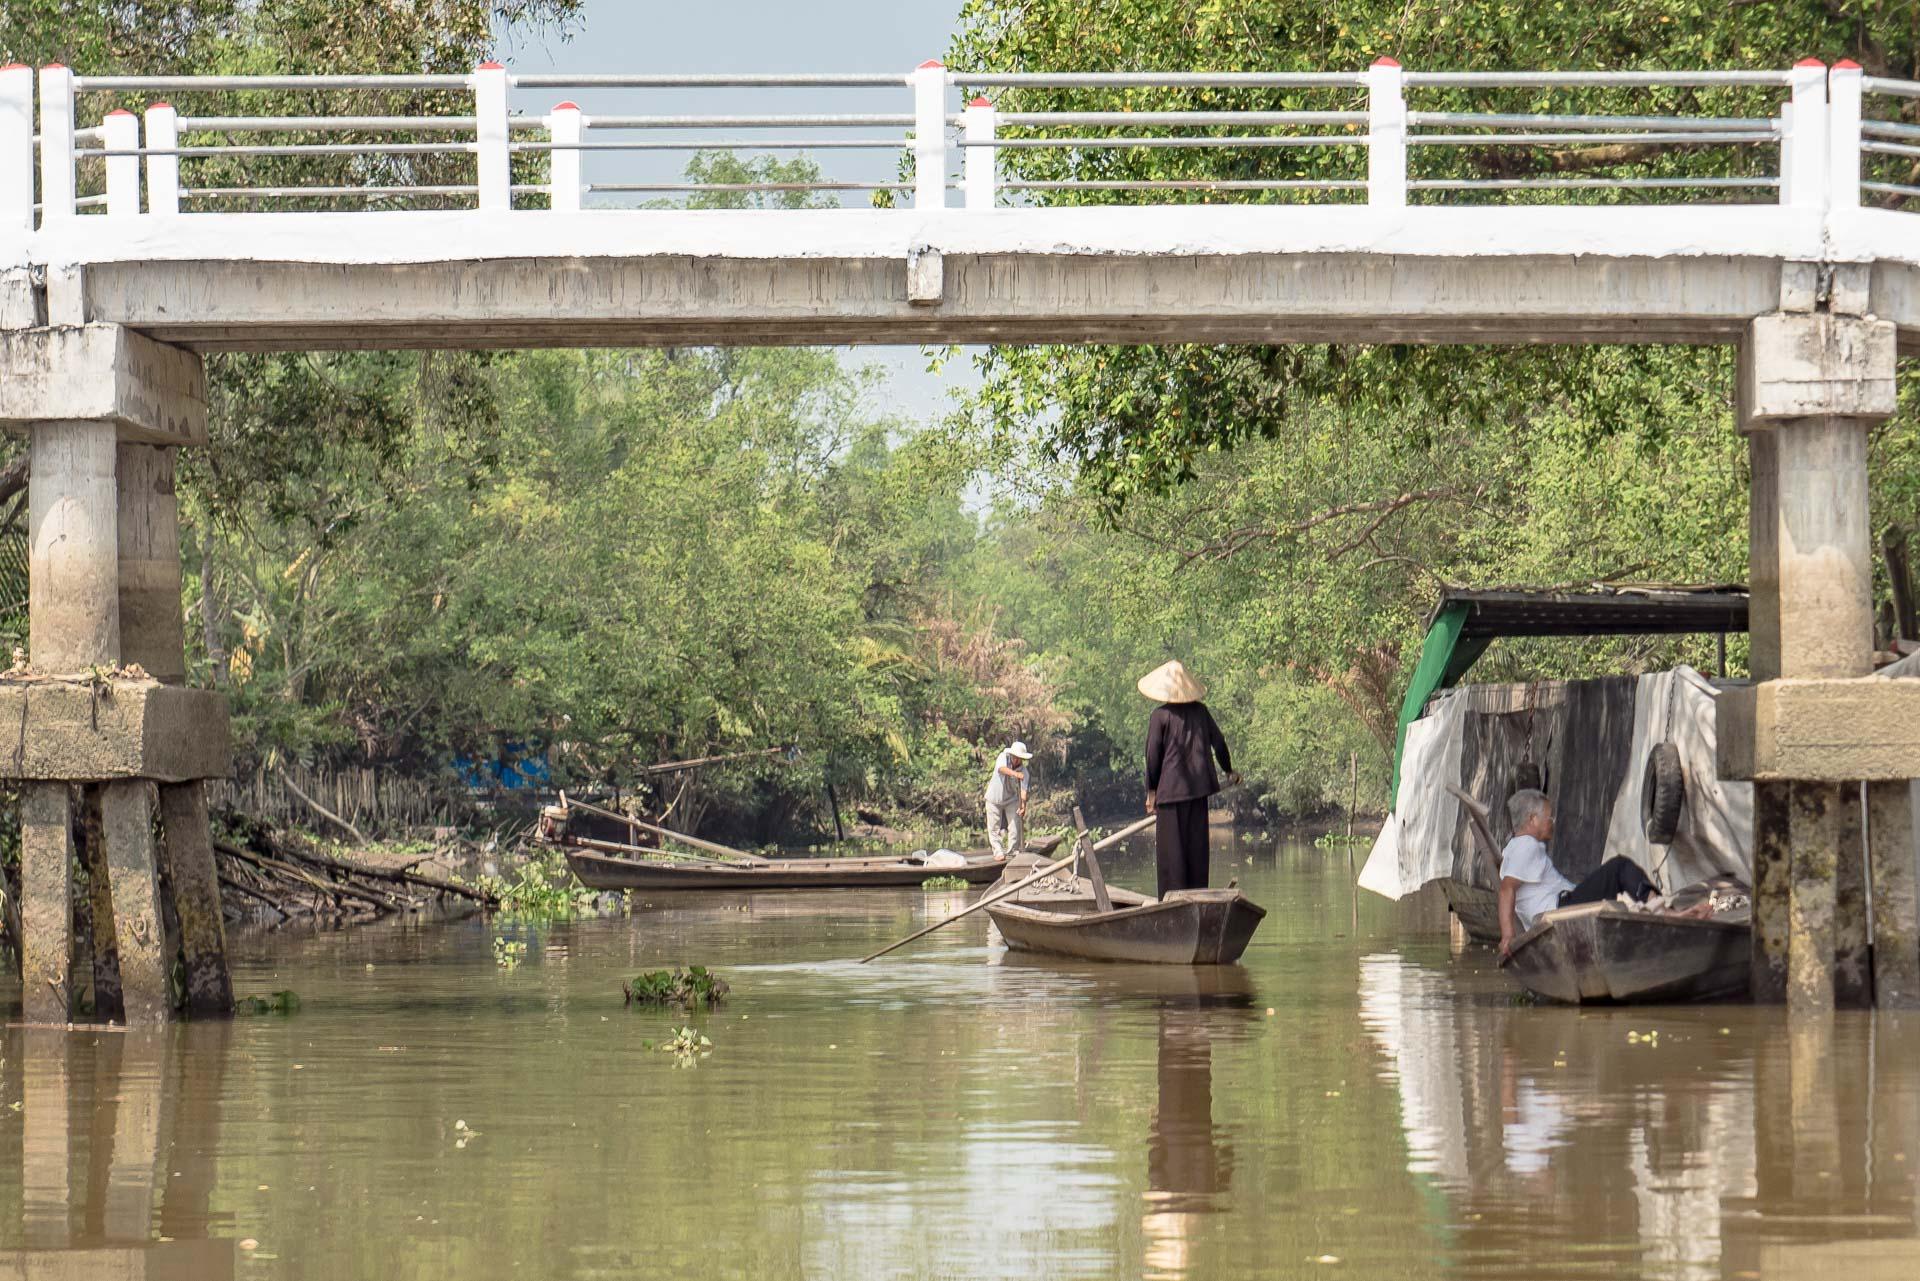 Lesvoyageuses-Vietnam-Saigon-Delta-Mekong-Les-Rives--33